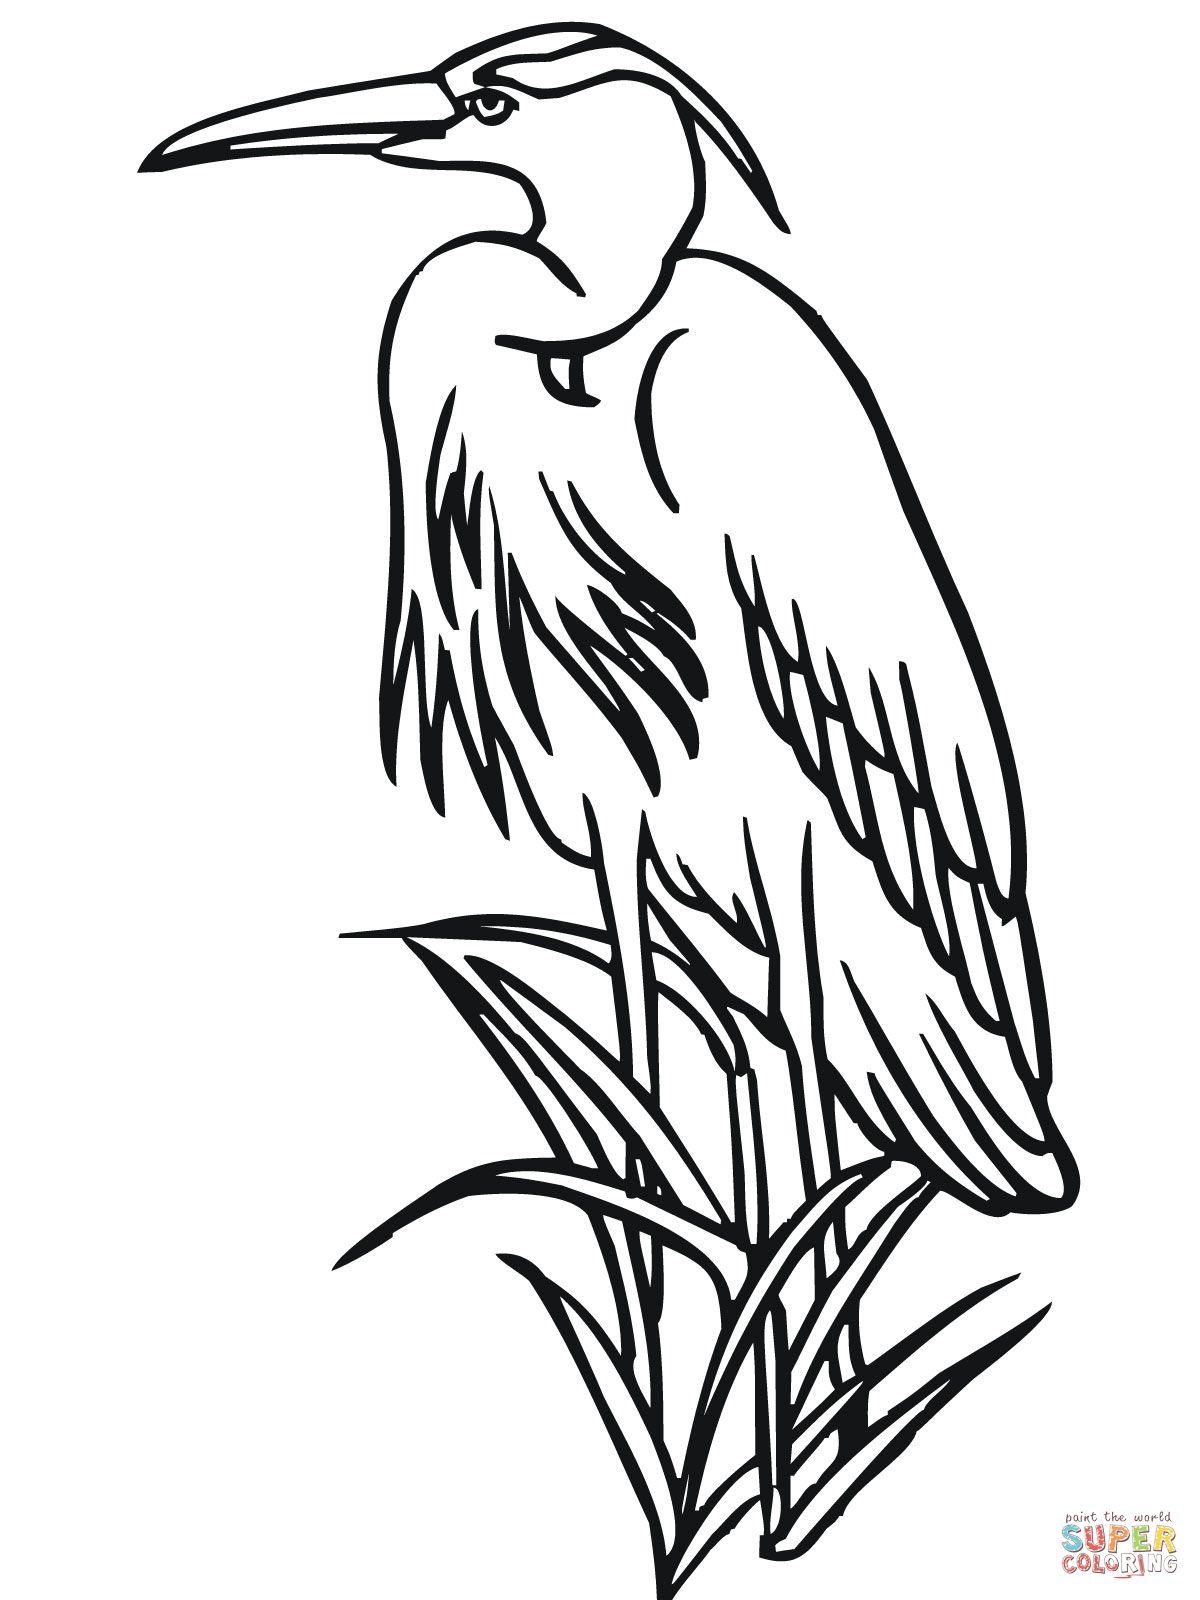 Heron In A Reed Coloring Page Jpg 1200 1600 Heron Art Watercolour Texture Background Heron